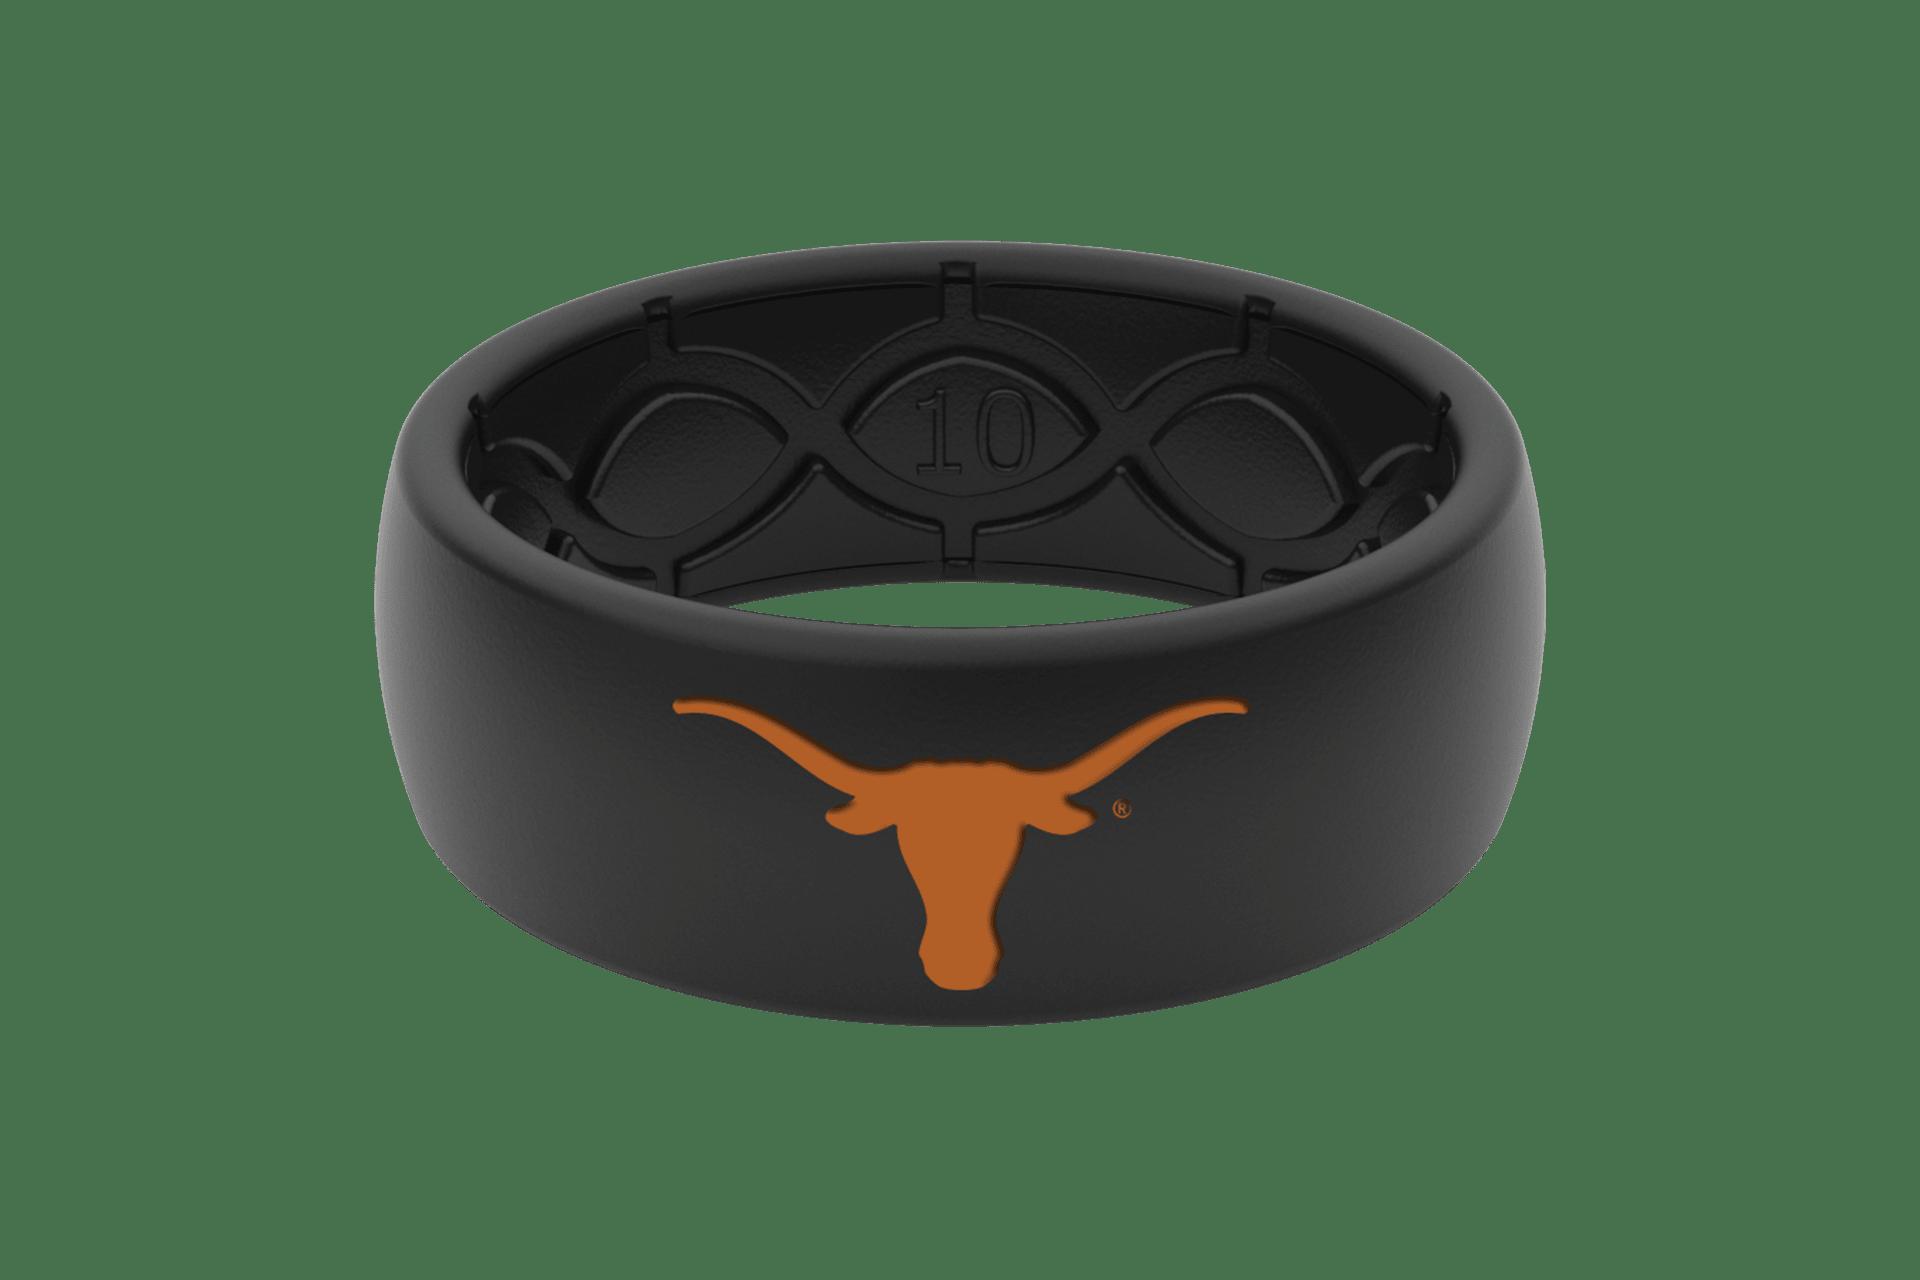 Original College Texas Black/Black/Orange - Groove Life Silicone Wedding Rings